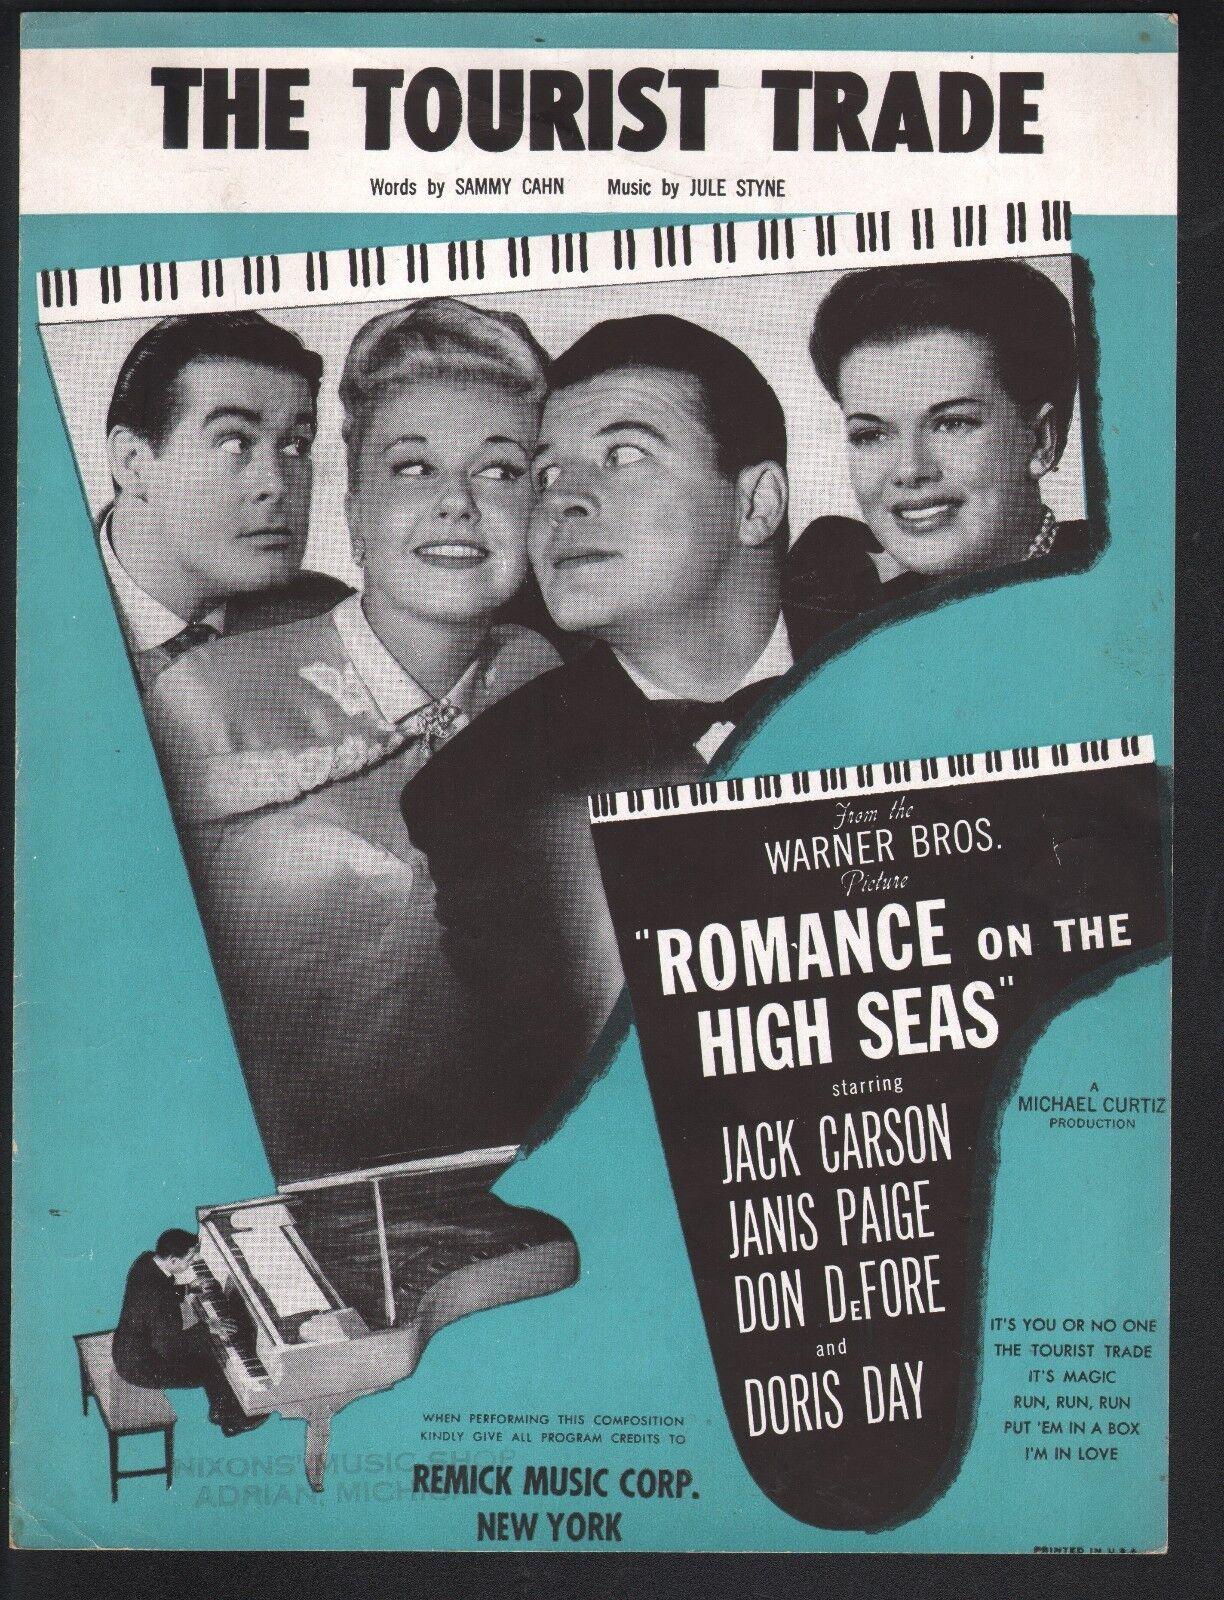 The Tourist Trade 1948 Doris Day Romance On The High Seas